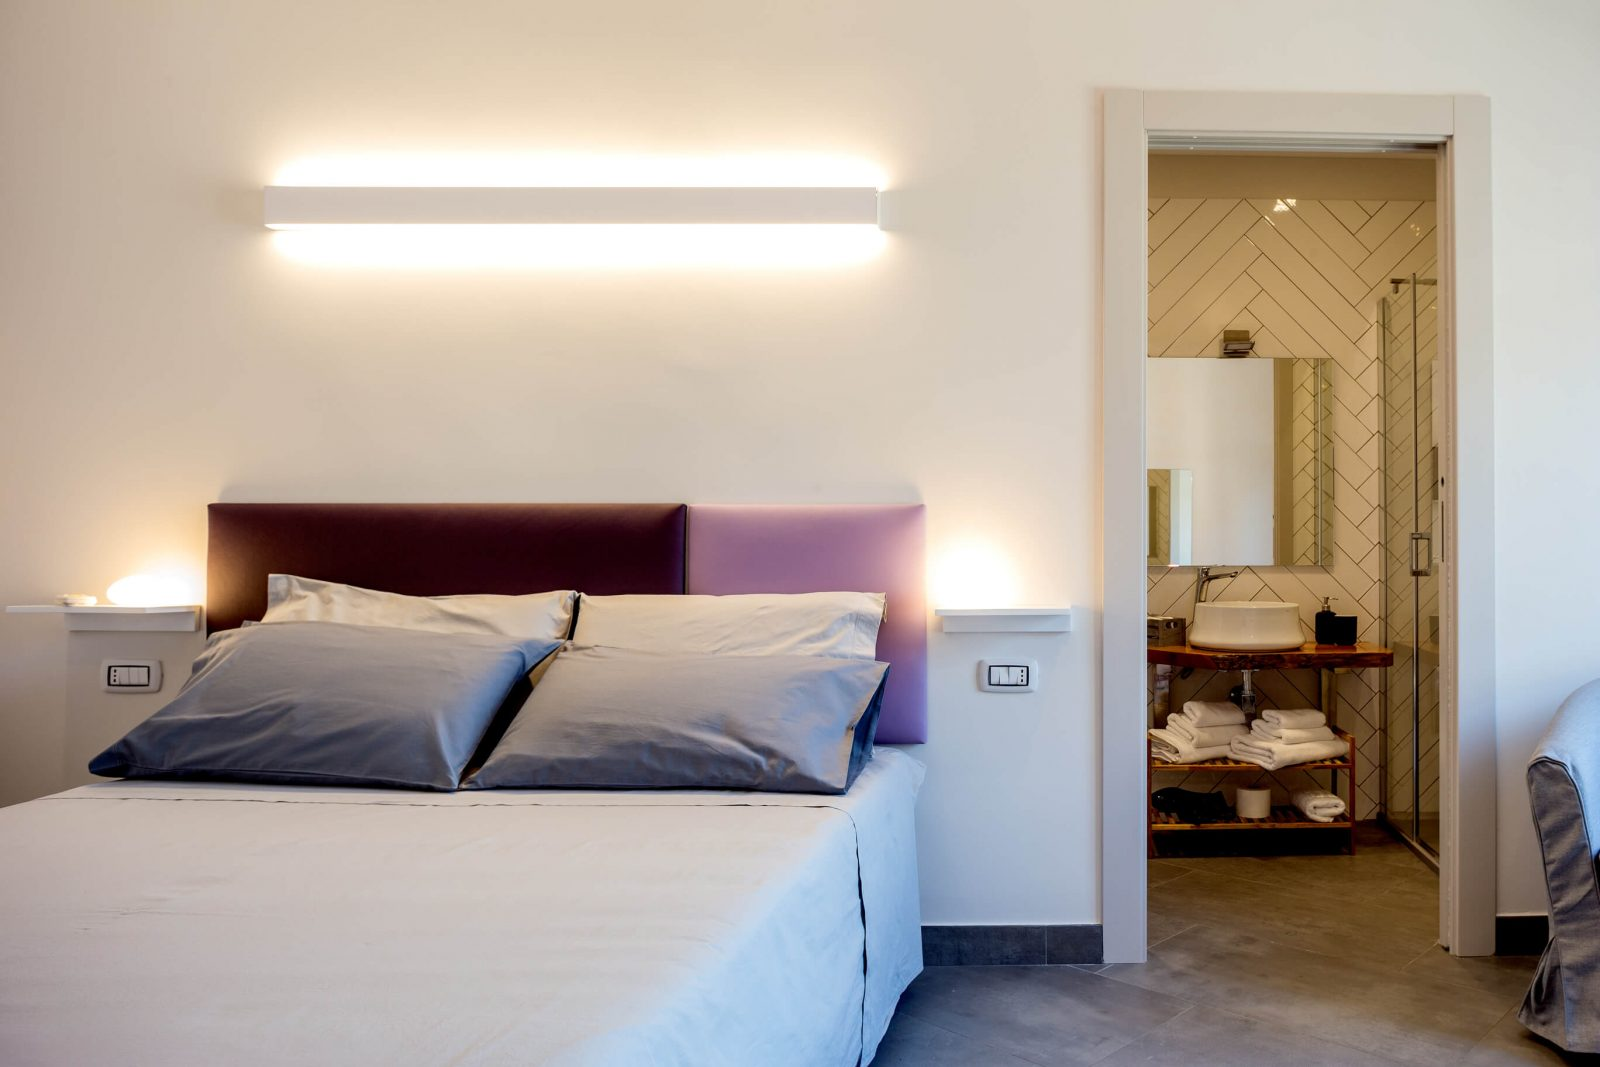 Centro Storico Via Sassari Bed and Breakfast